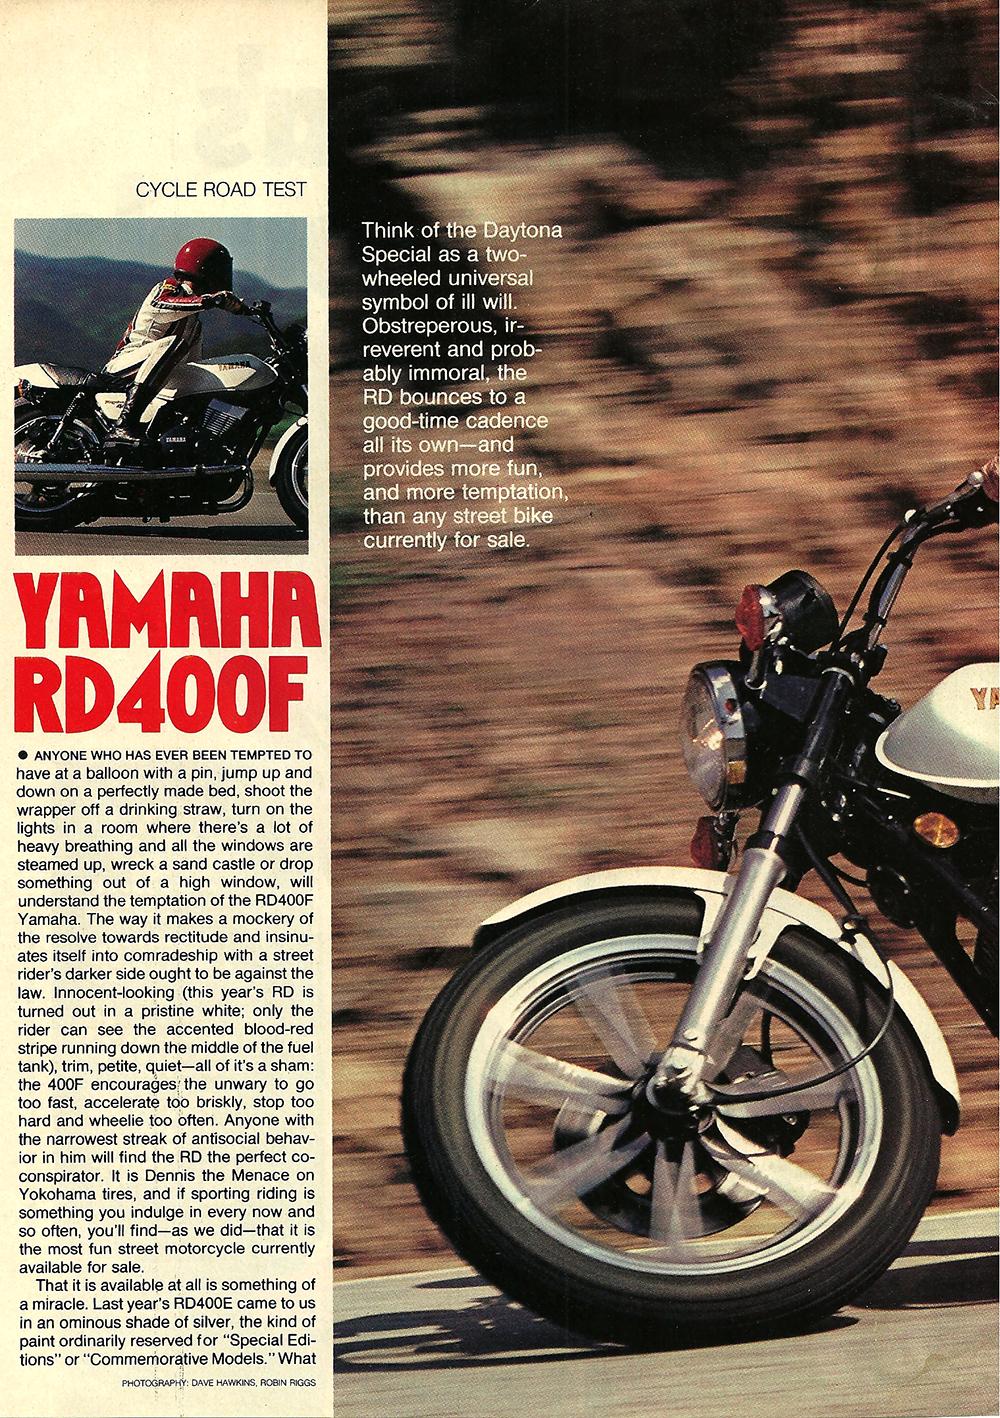 1979 Yamaha RD400F road test 01.jpg